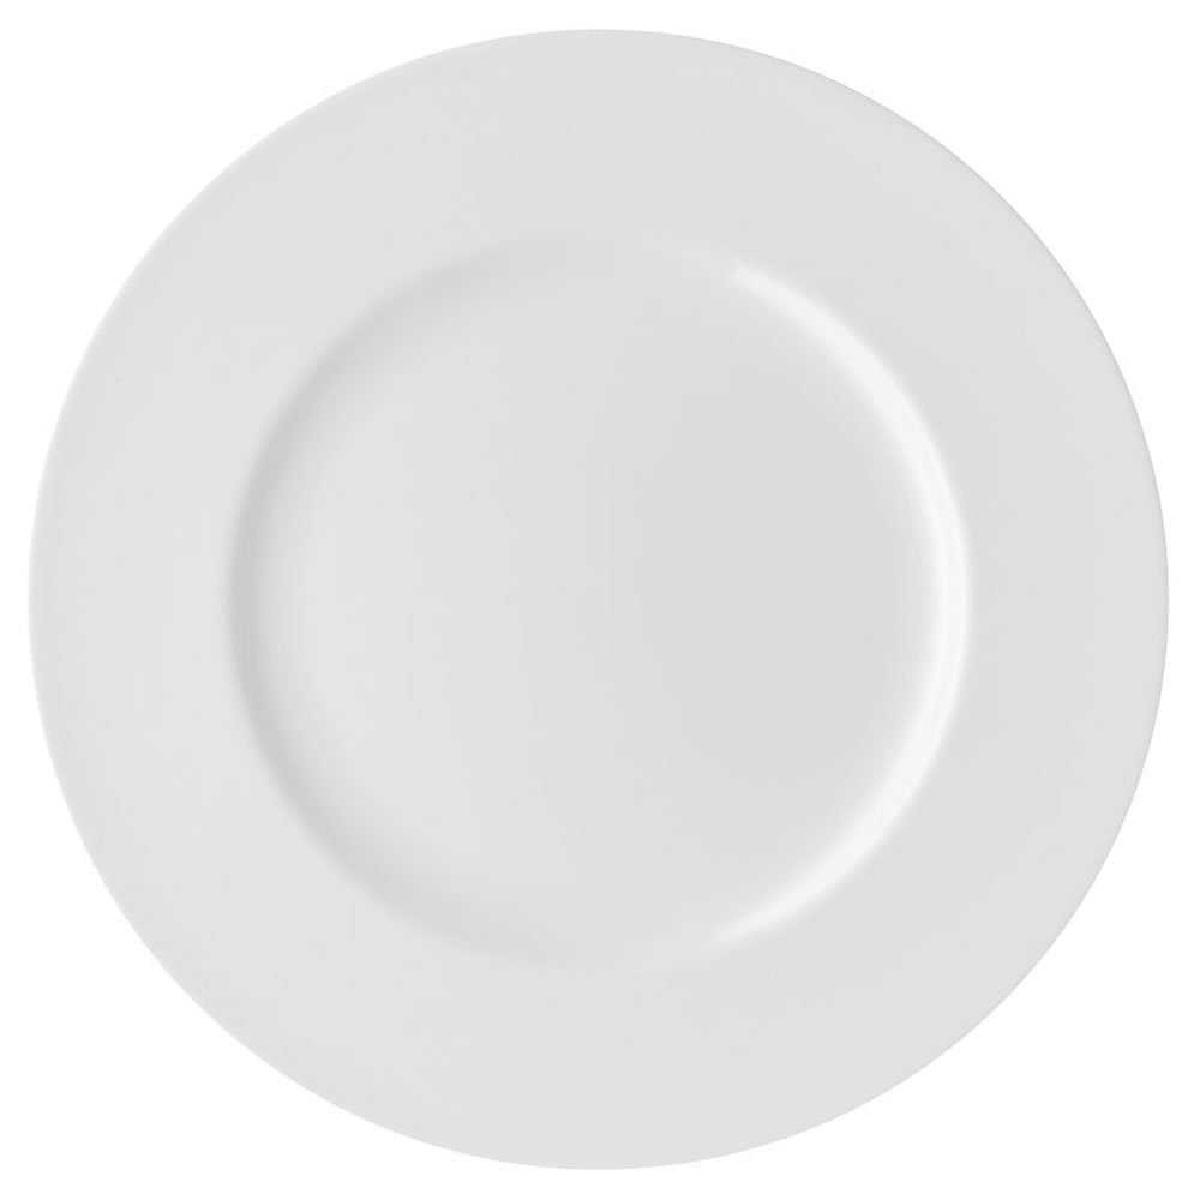 Онлайн каталог PROMENU: Тарелка основная фарфоровая Rosenthal JADE, диаметр 27 см, белый Rosenthal 61040-800001-10027